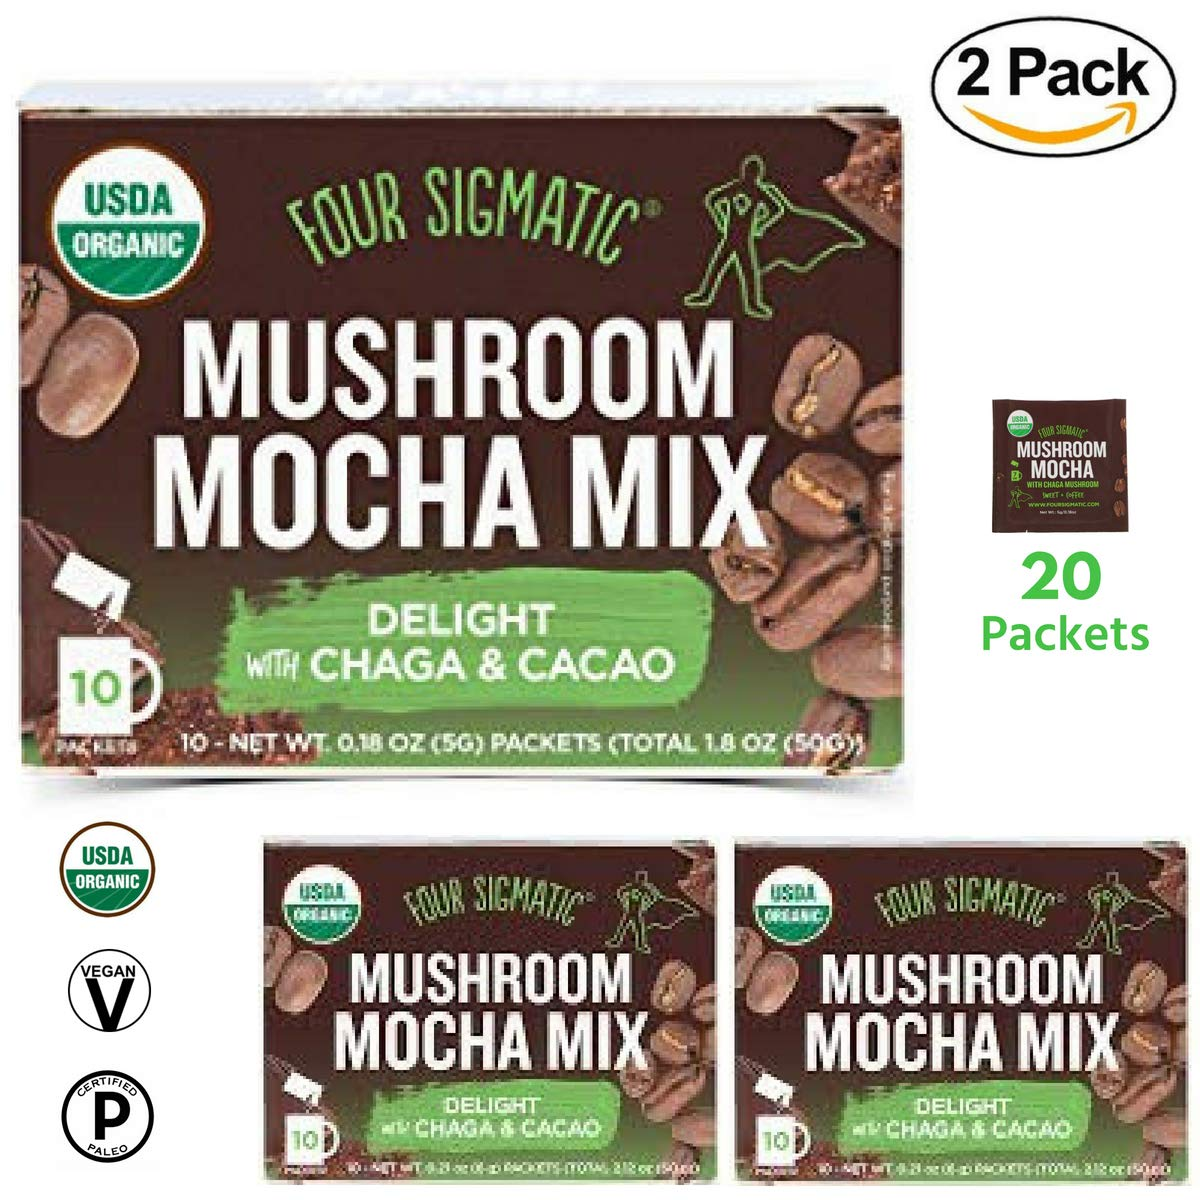 Four Sigmatic - Mushroom Mocha Mix with Chaga & Cacao (2 Packs of 10 Packets) - Support Immune System, Antioxidant, Memory Function. Elevated Mood - USDA Organic, Vegan & Paleo